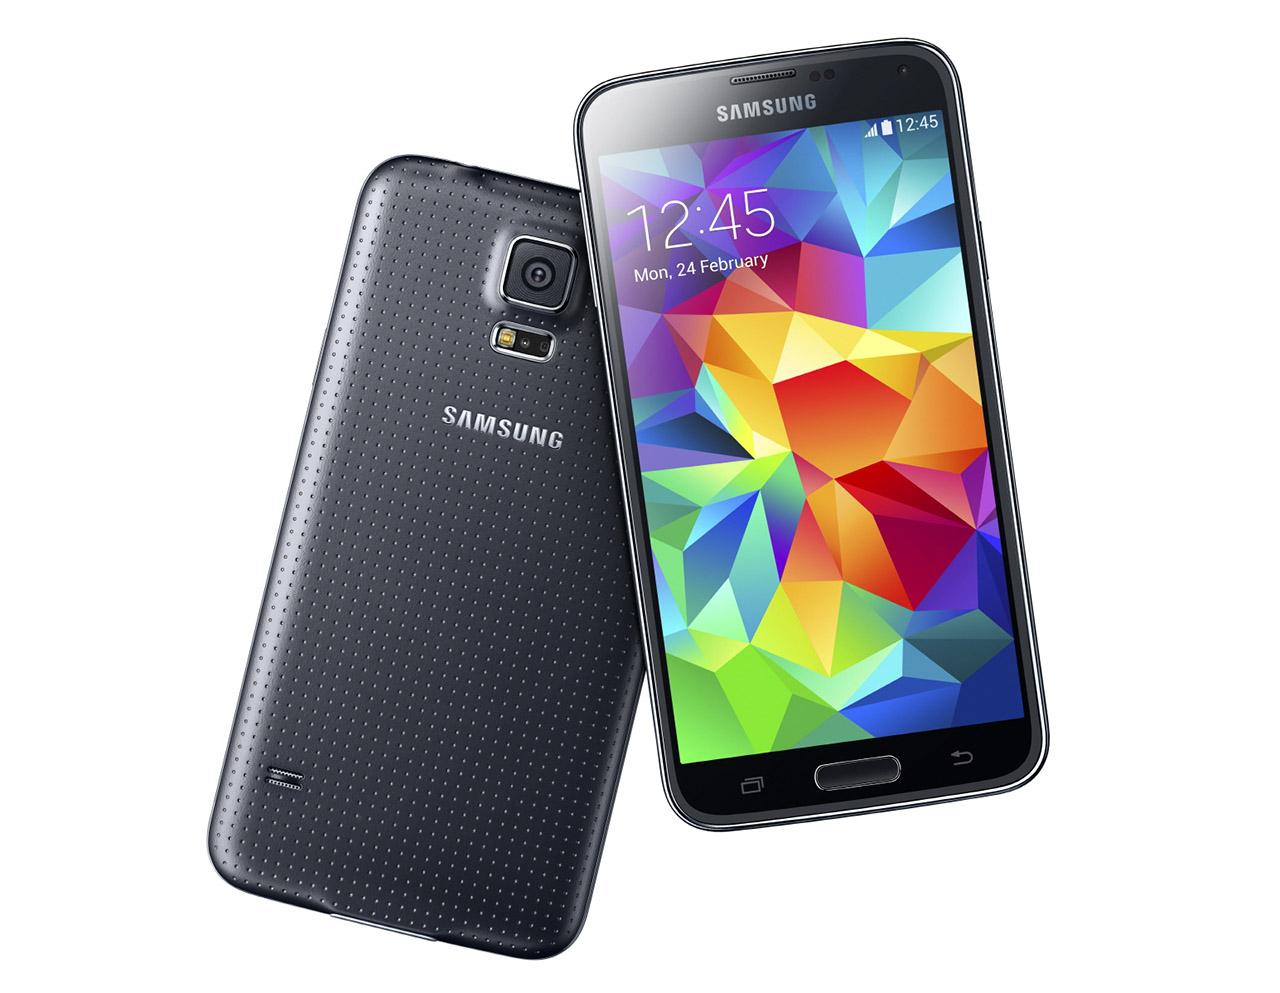 Sony Galaxy S5